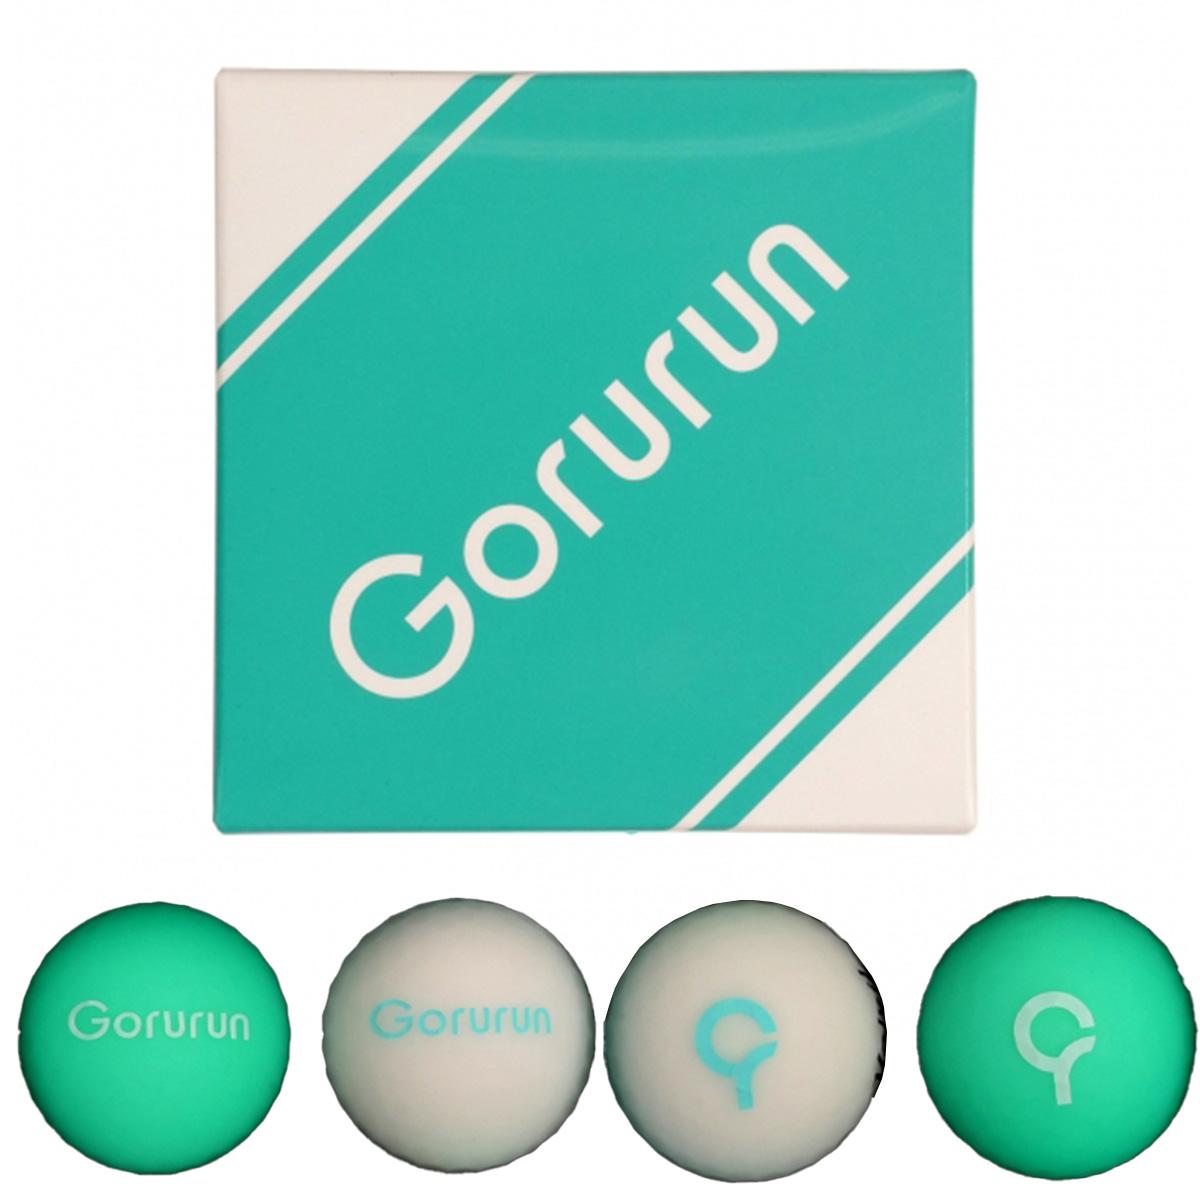 Gorurun × Volvikゴルフボール 4個入り